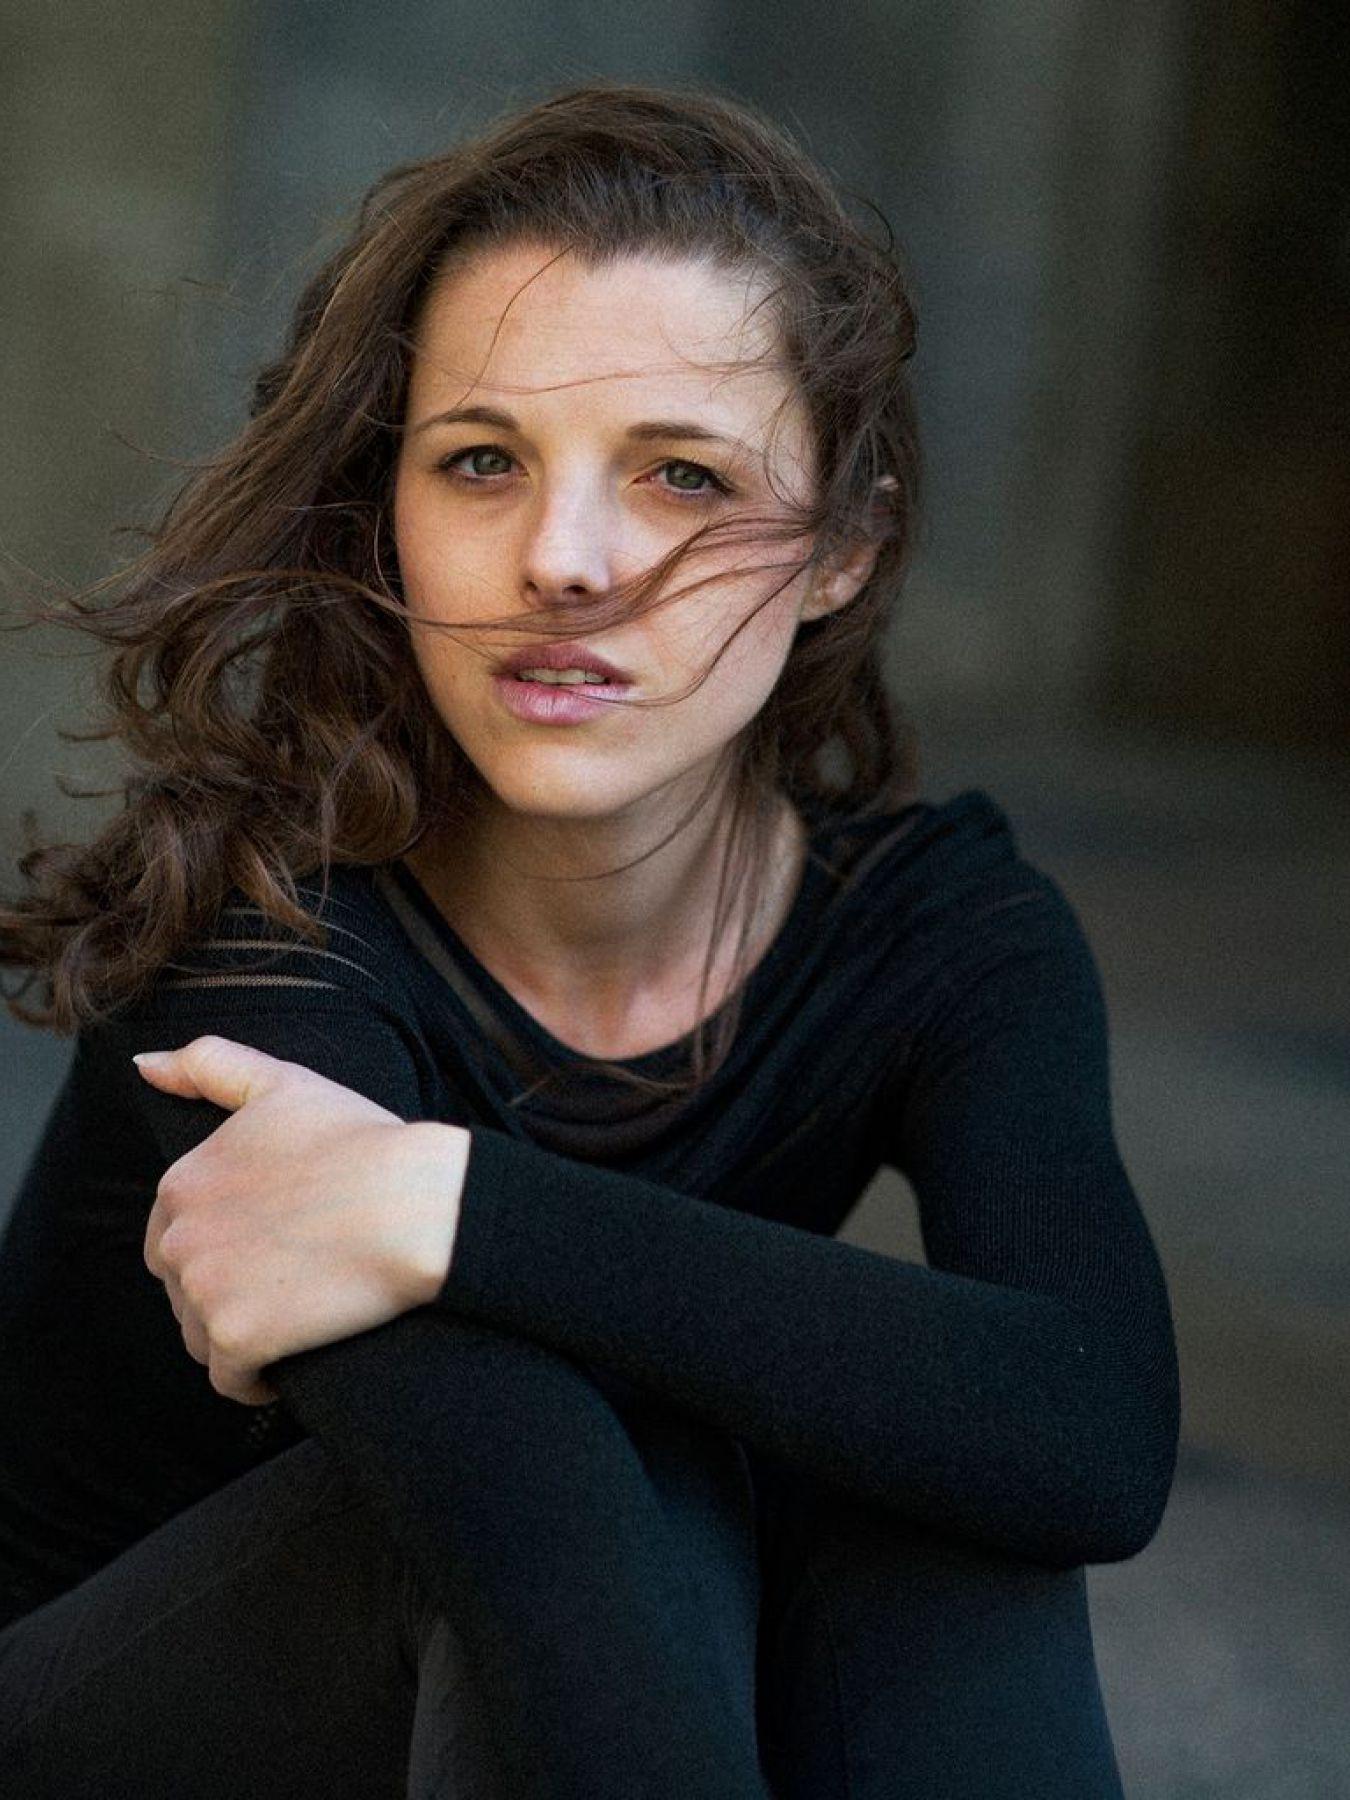 Jessica Brösicke, Actors Agency Osman, Schauspielagentur